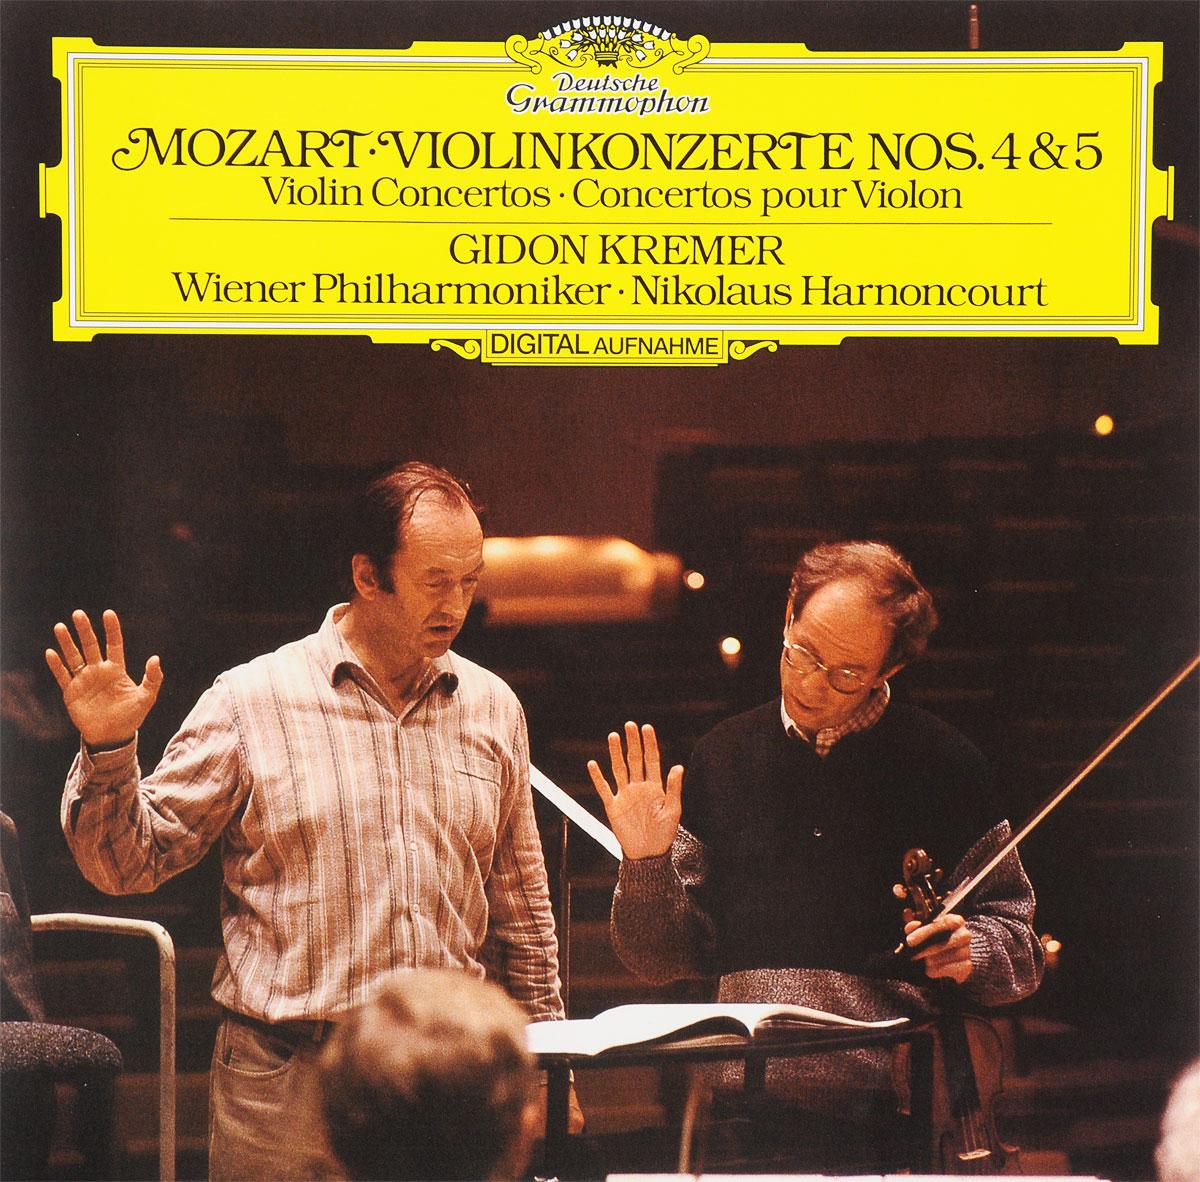 Гидон Кремер,Wiener Philharmoniker,Николаус Арнонкур Gidon Kremer. Mozart. Violinkonzerte Nos. 4 & 5 (LP) арнонкур николаус музыка барокко путь к новому пониманию